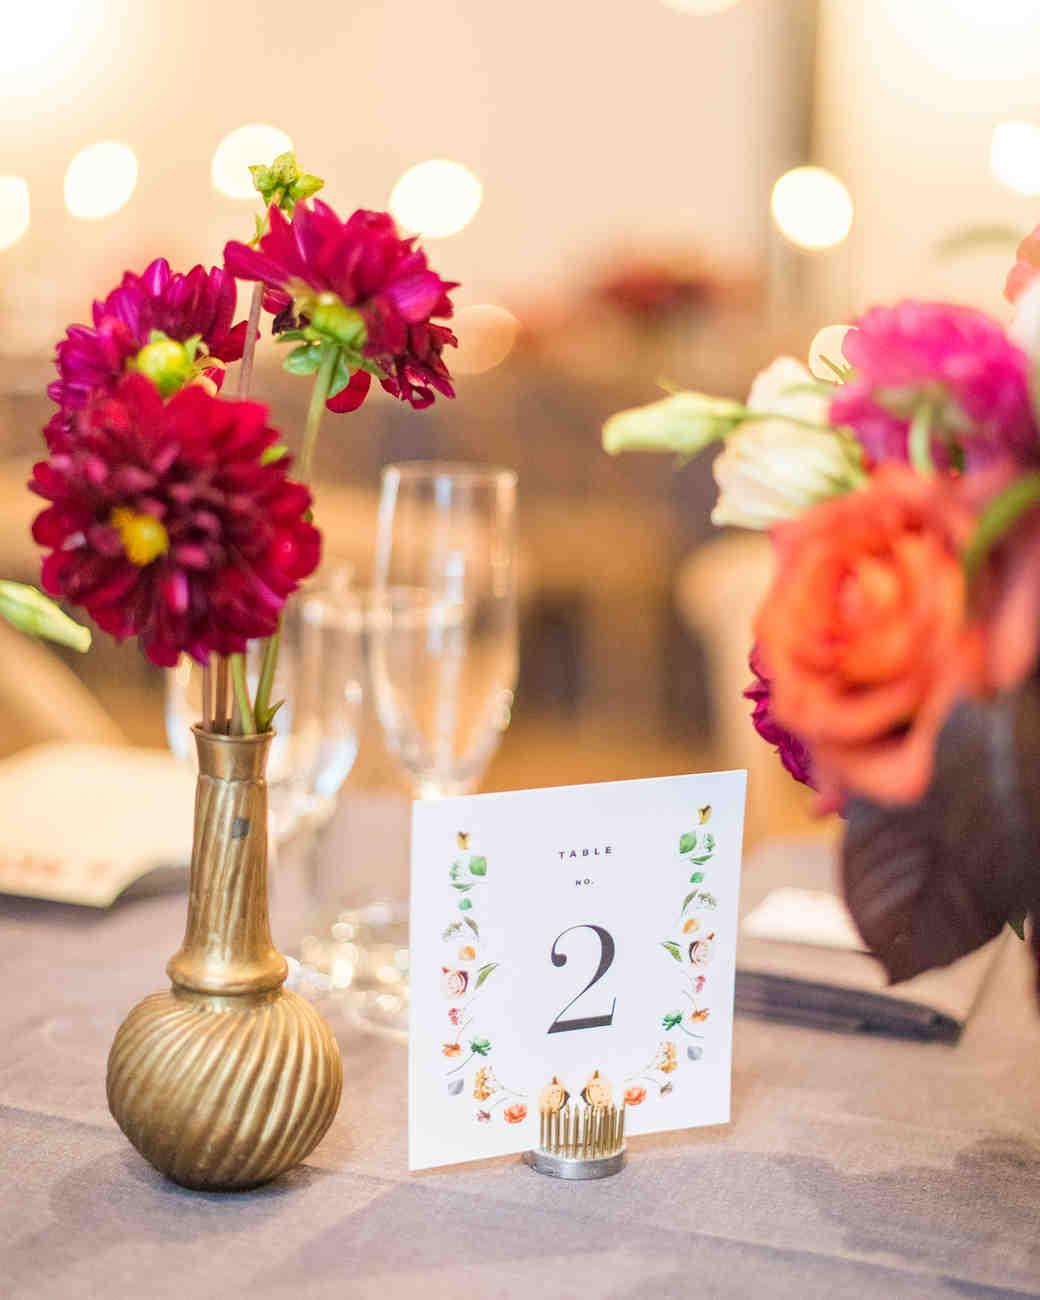 caitlin-michael-wedding-tablenumber-721-s111835-0415.jpg